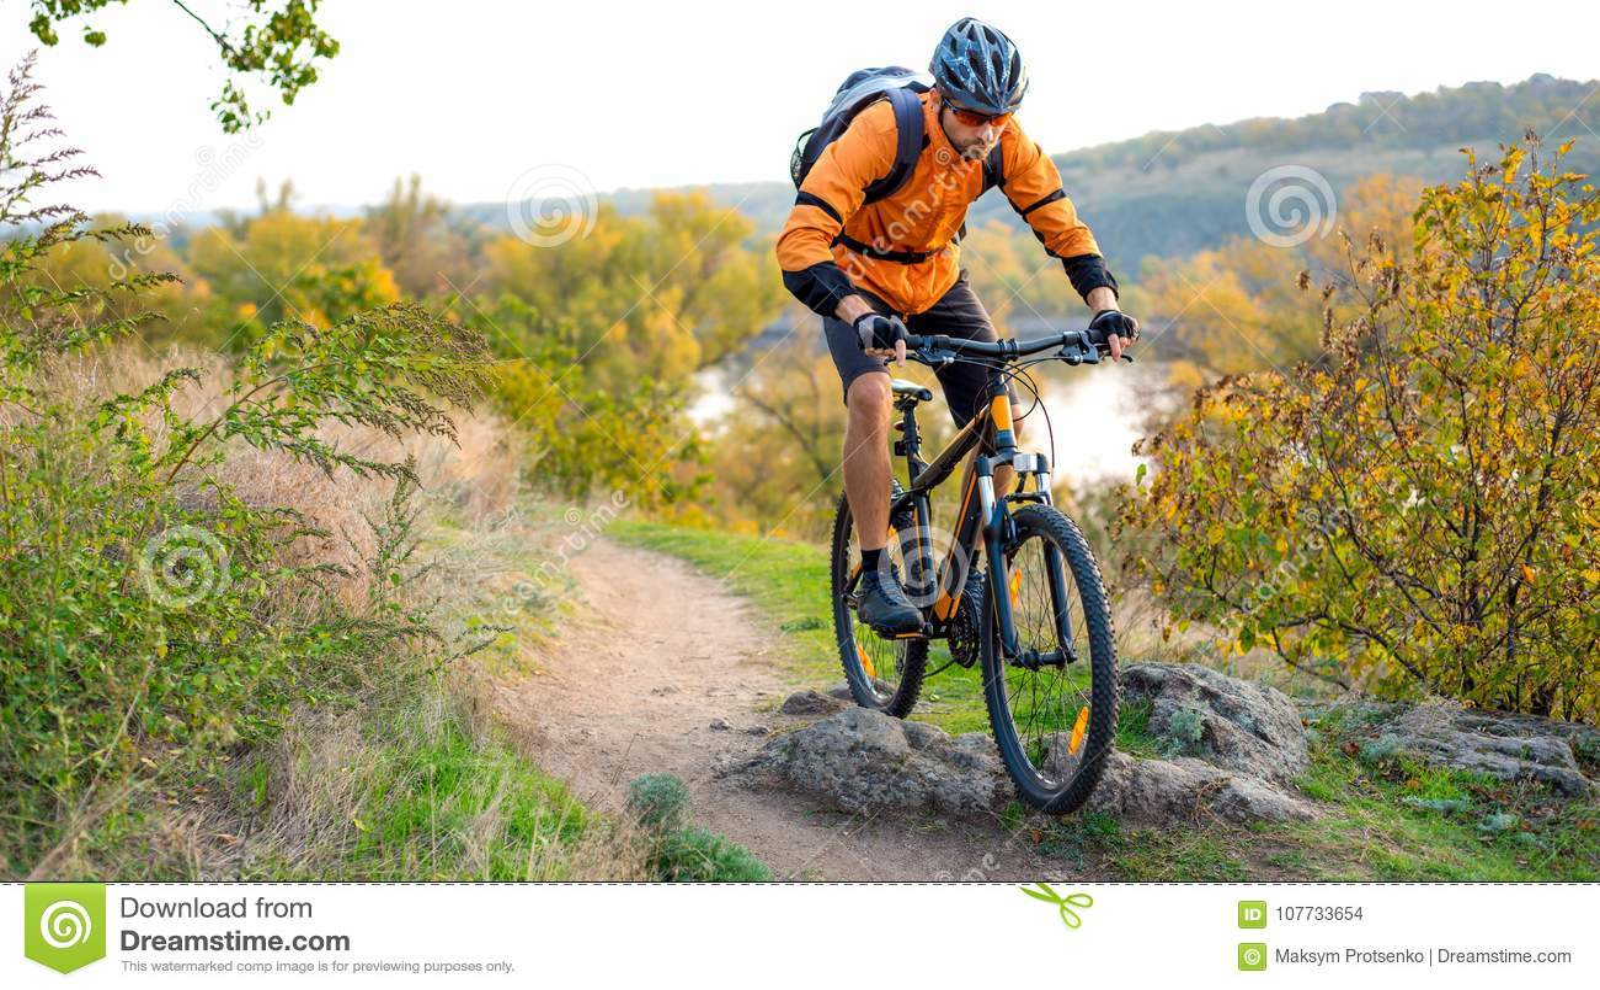 Cyclist in Orange Riding the Mountain Bike on the Autumn Rocky Trail. Extreme Sport and Enduro Biking Concept.